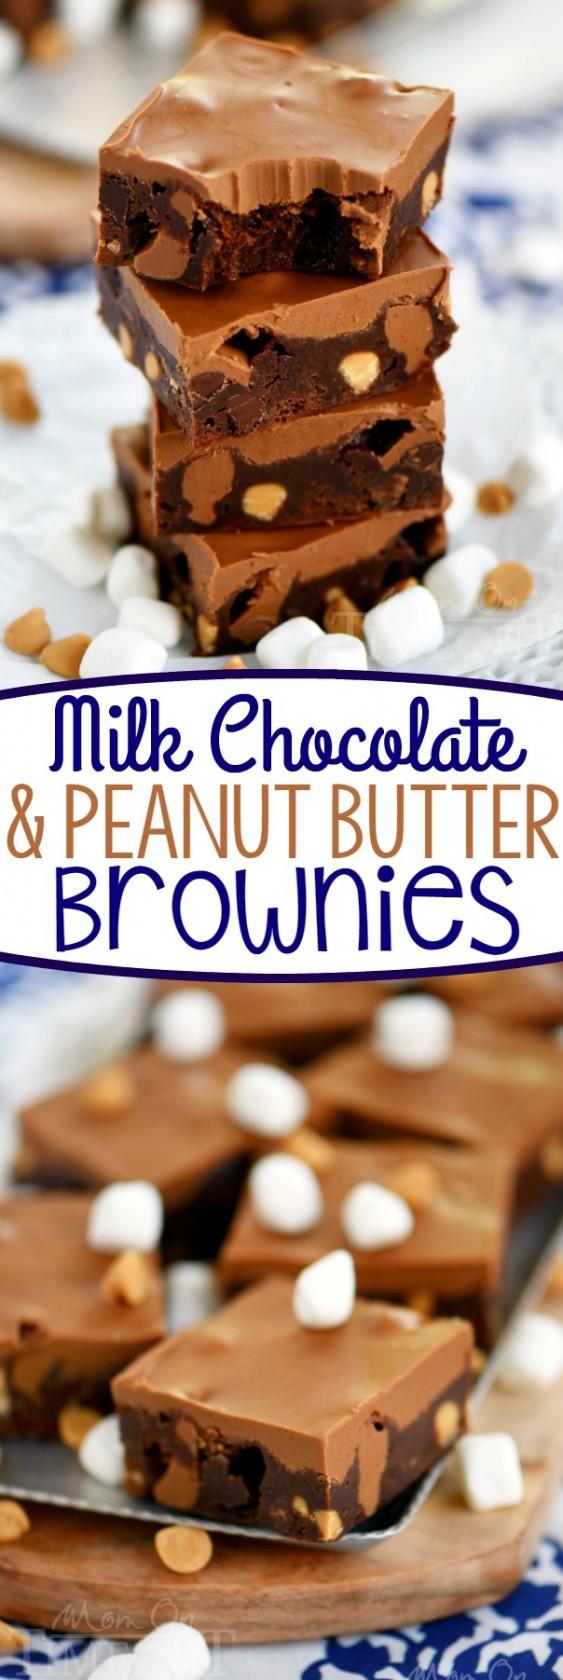 Milk Chocolate Peanut Butter Brownies